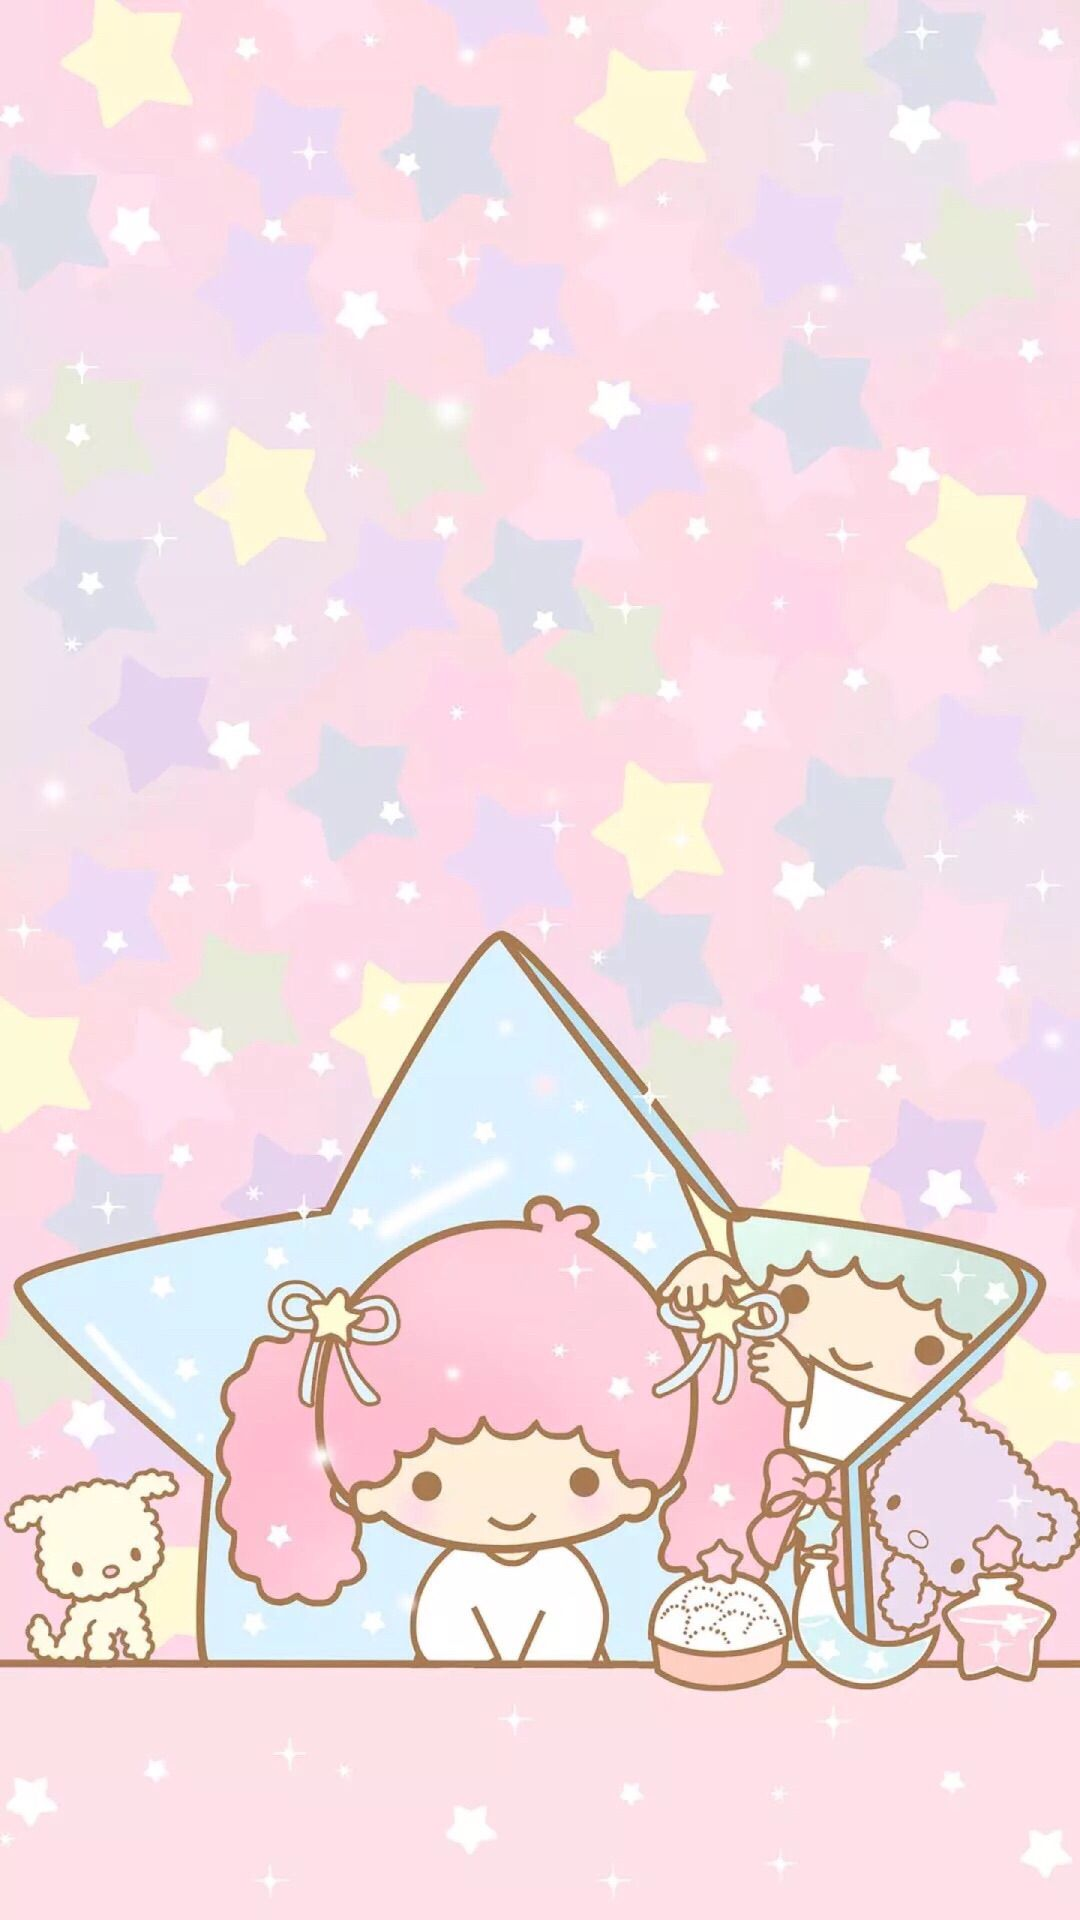 Wonderful Wallpaper Hello Kitty Sakura - 2e9cd29e2839cc3b4d3848346dc28aa0  Trends_152118.jpg